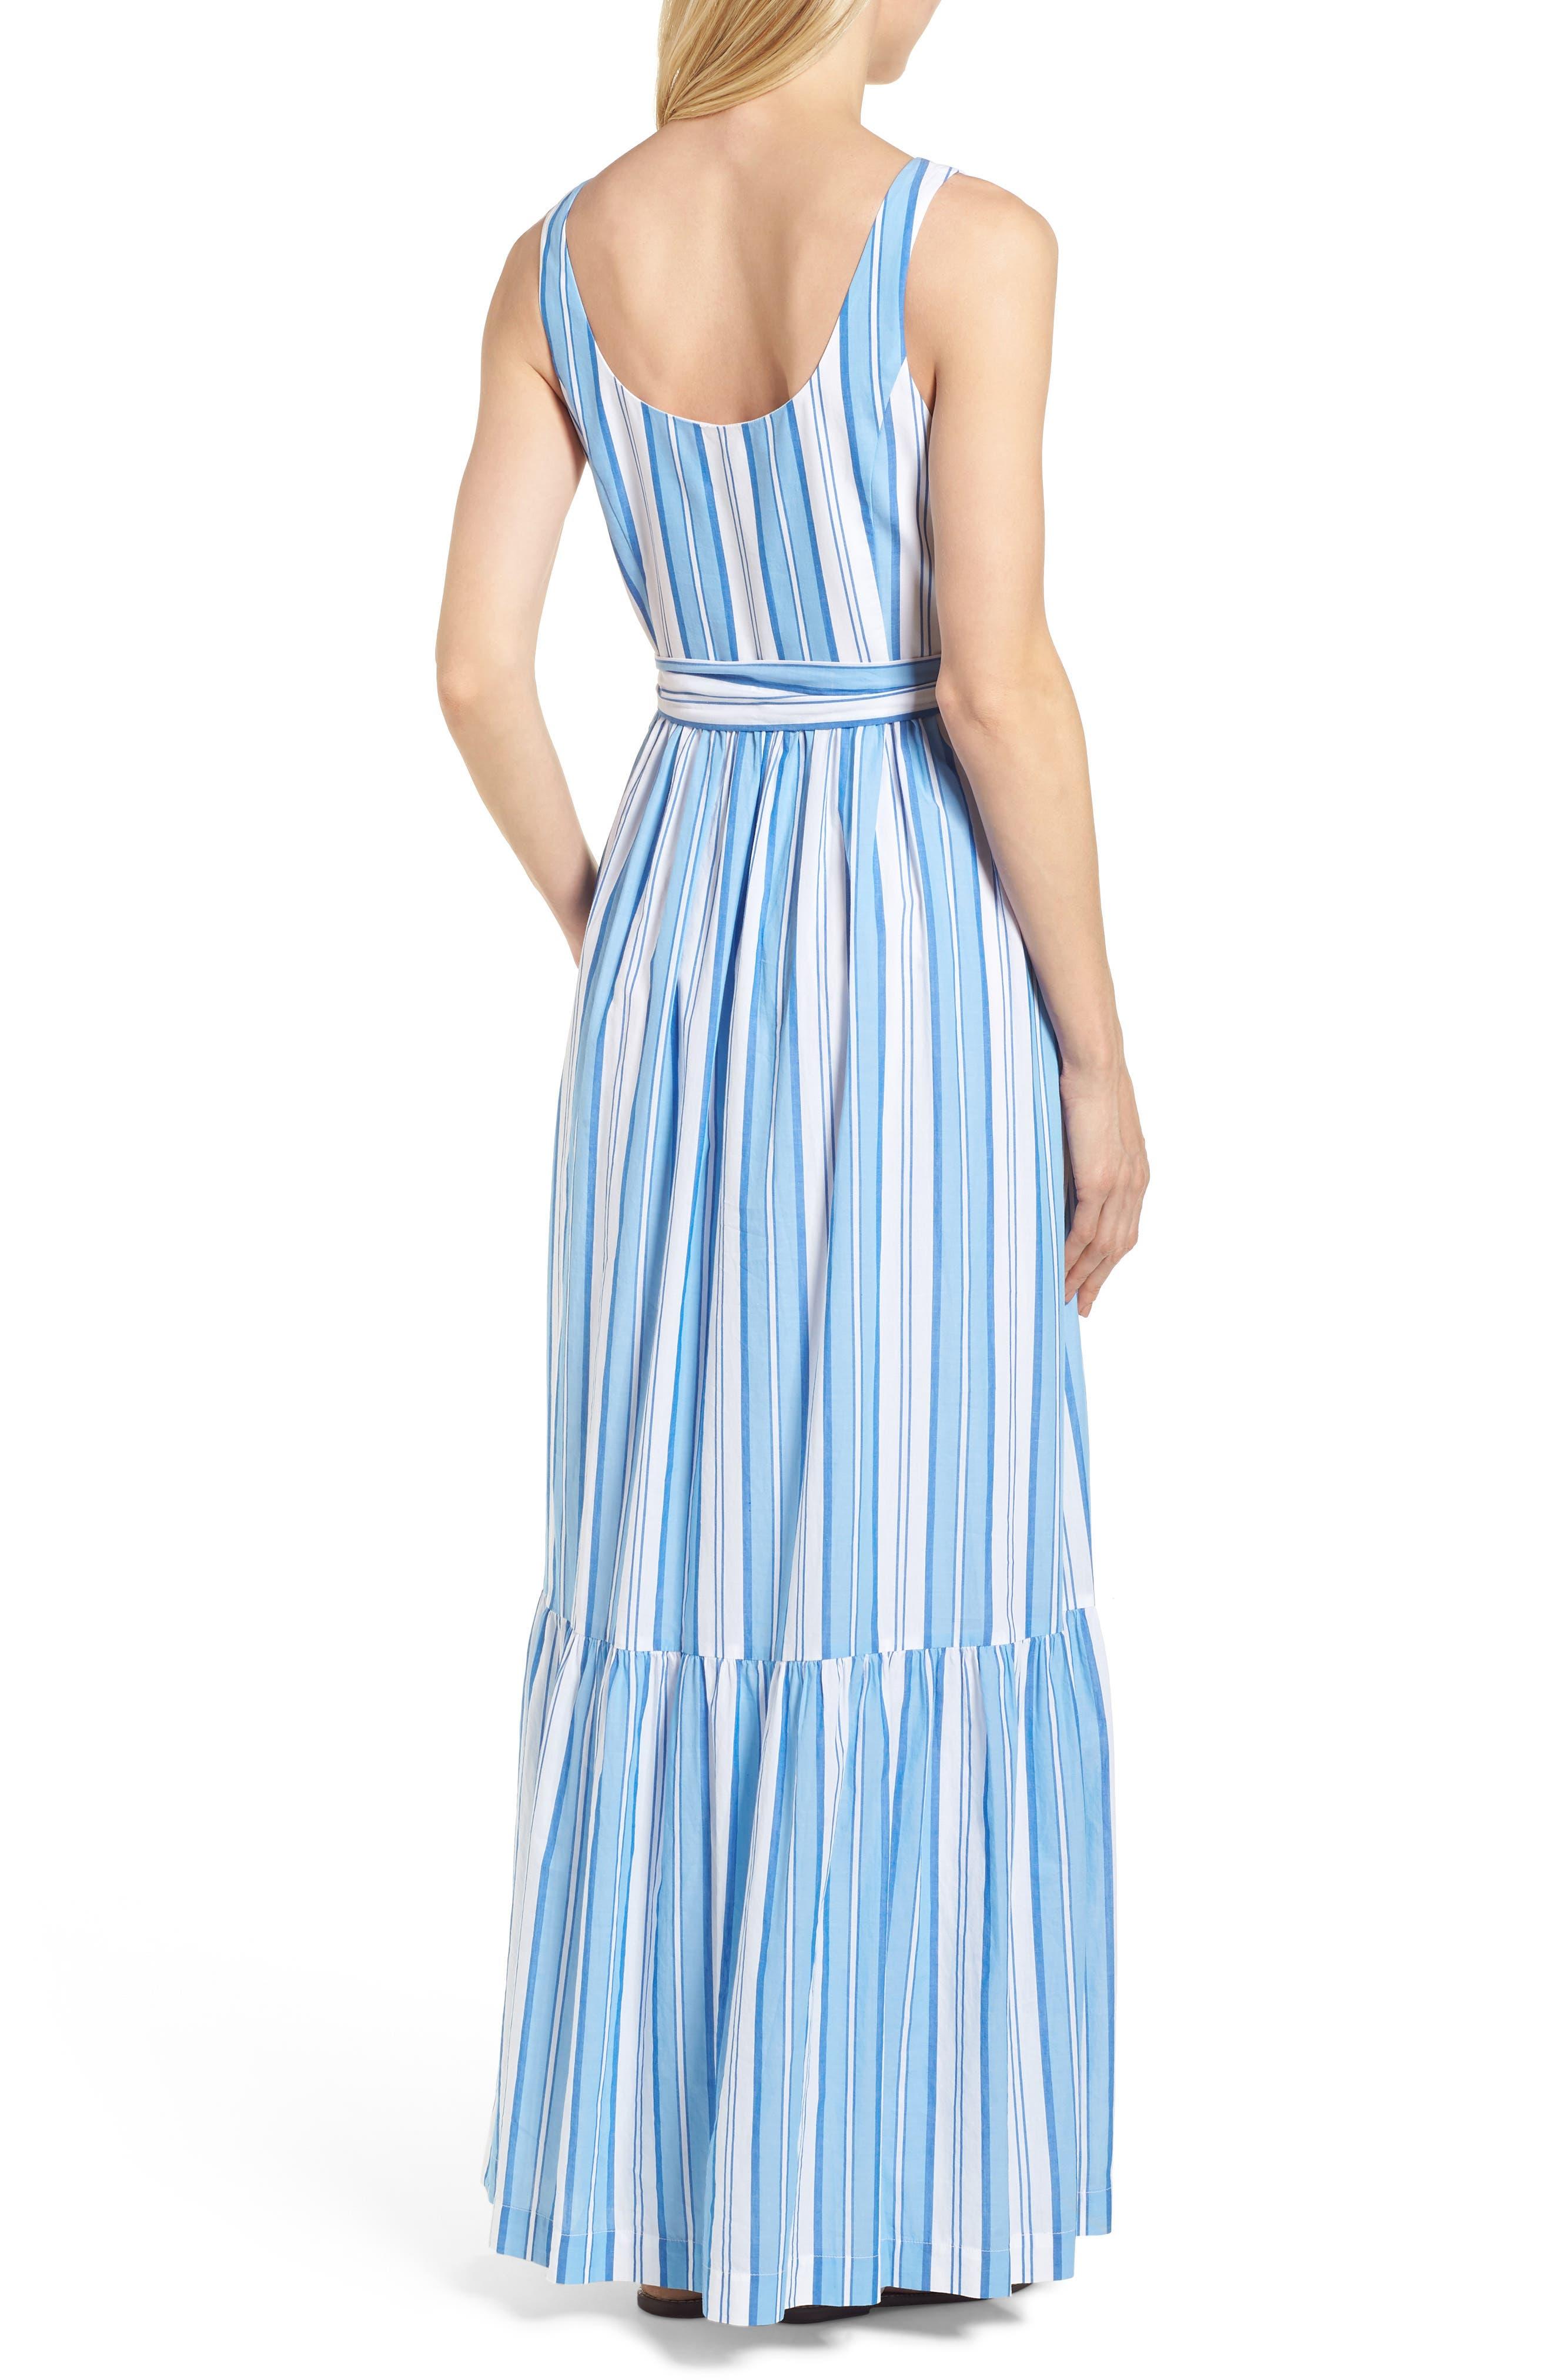 Ocean Stripe Tiered Maxi Dress,                             Alternate thumbnail 2, color,                             Blue Jay